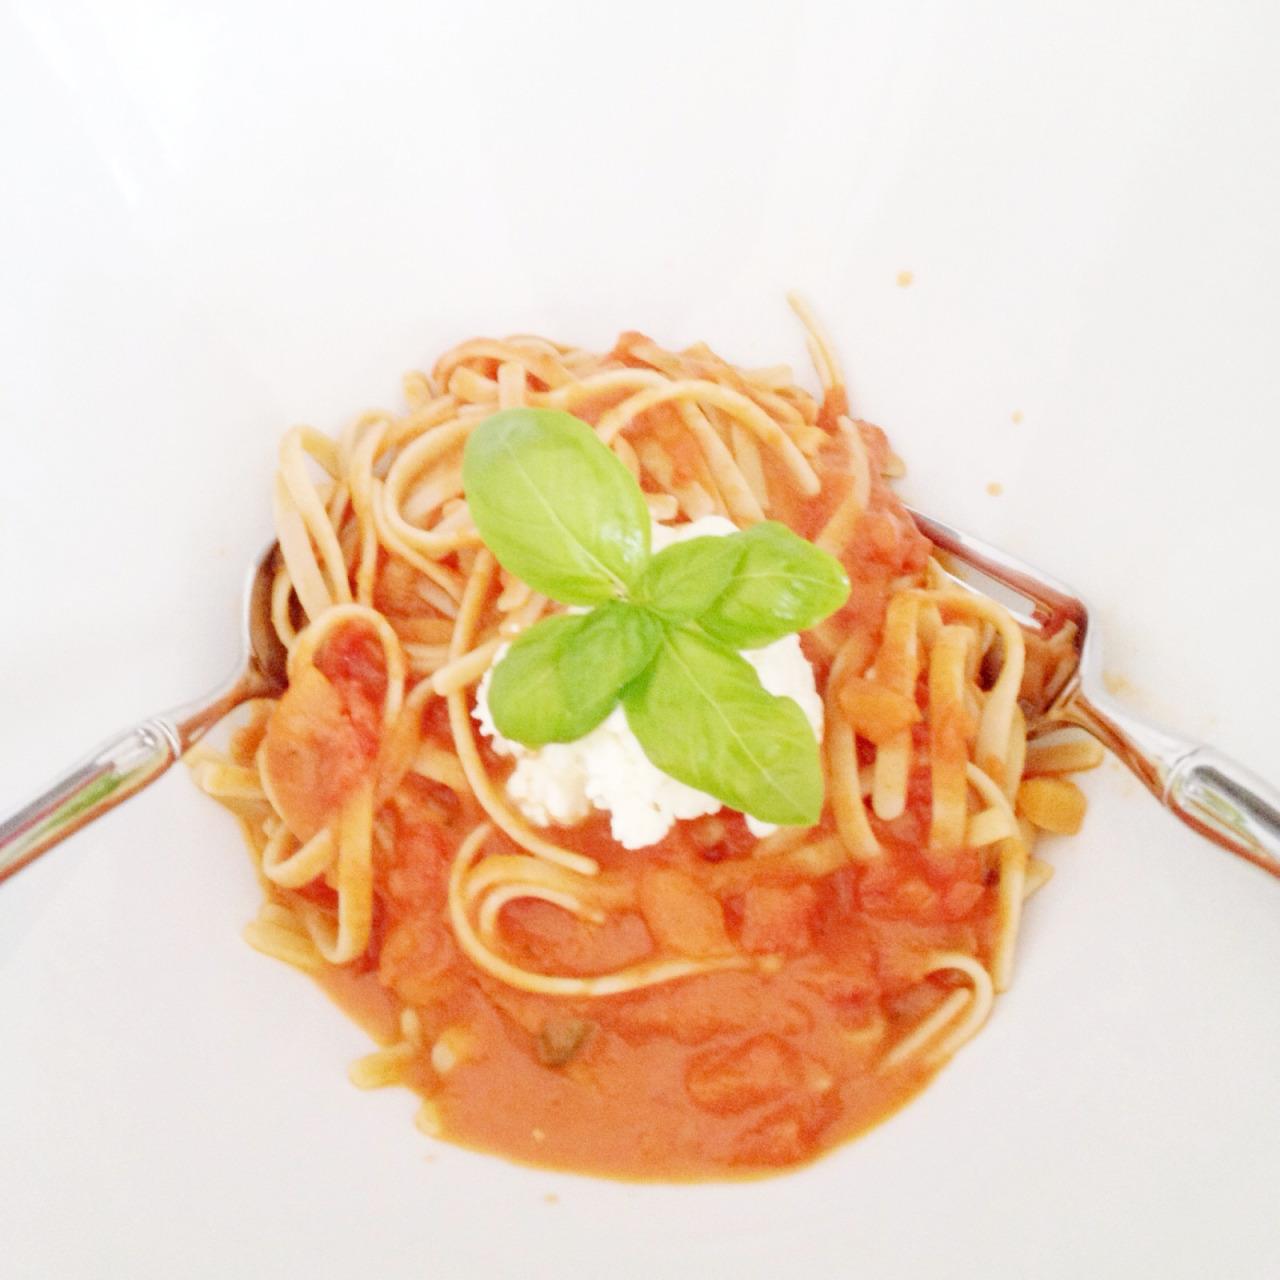 plum tomato sauce and homemade ricotta. recipe coming soon.